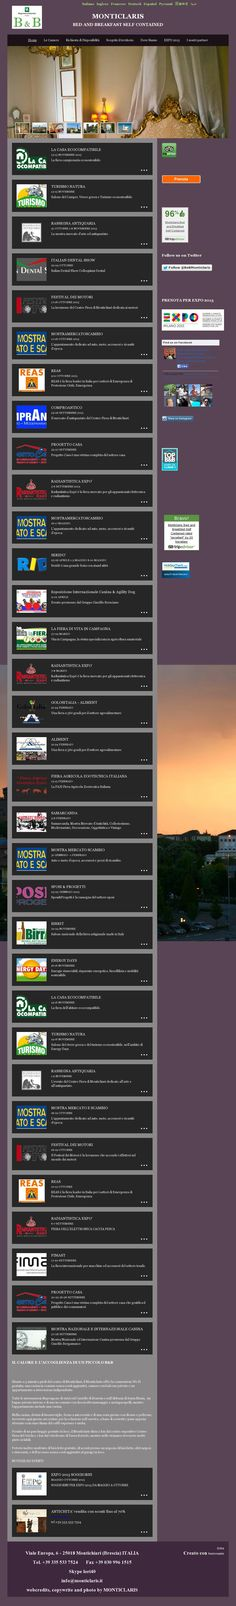 The website 'monticlaris.it' courtesy of @Pinstamatic (http://pinstamatic.com)